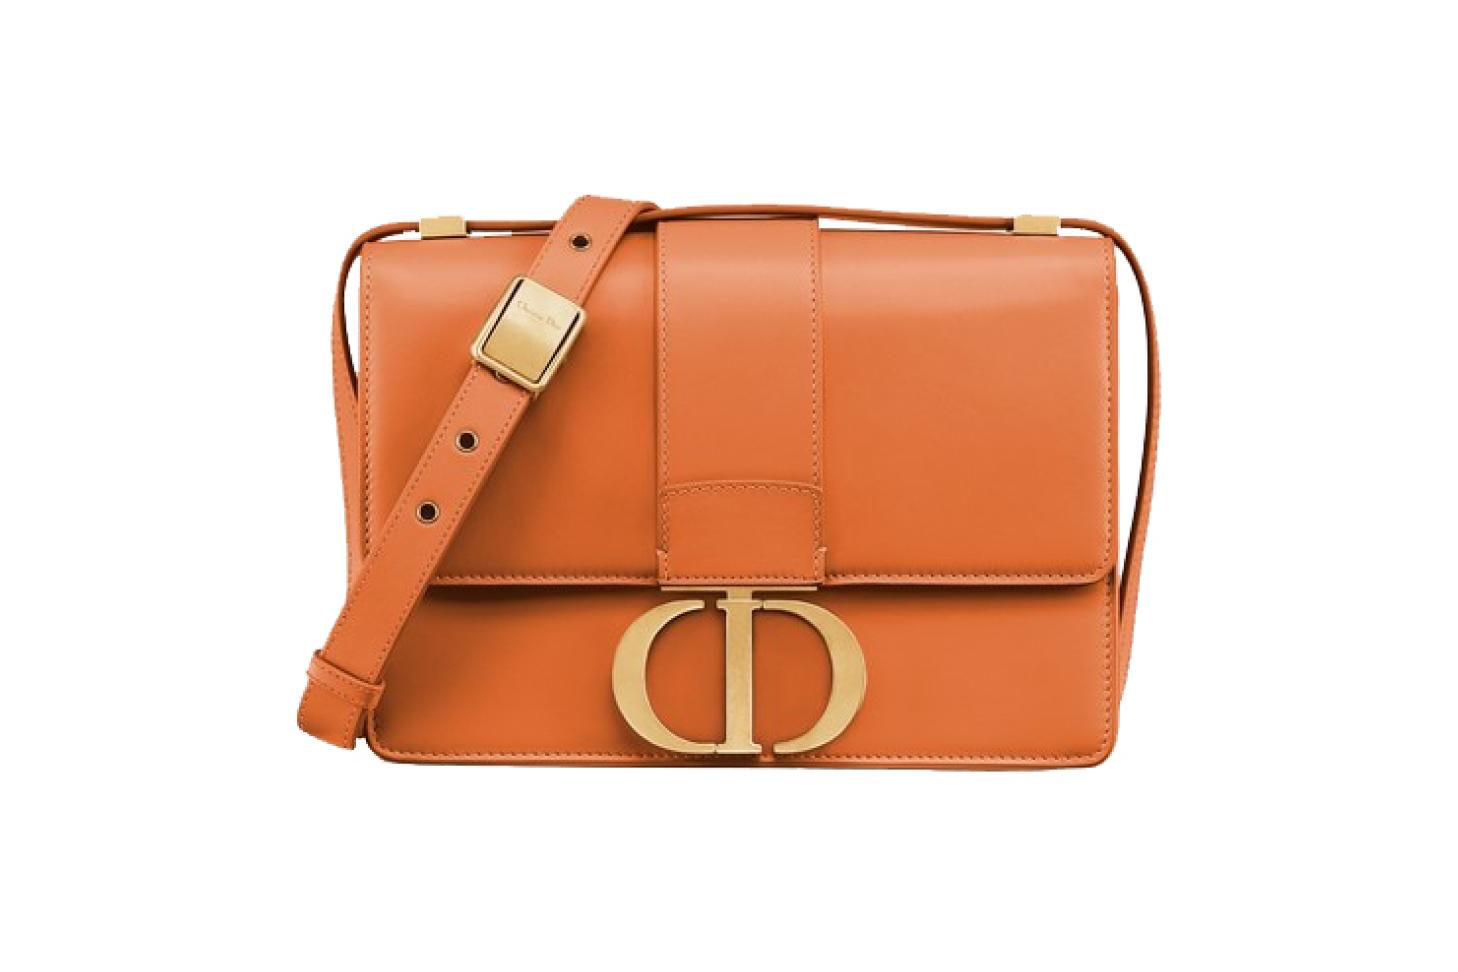 Orange 30 Montaigne Smooth Lambskin Flap Bag